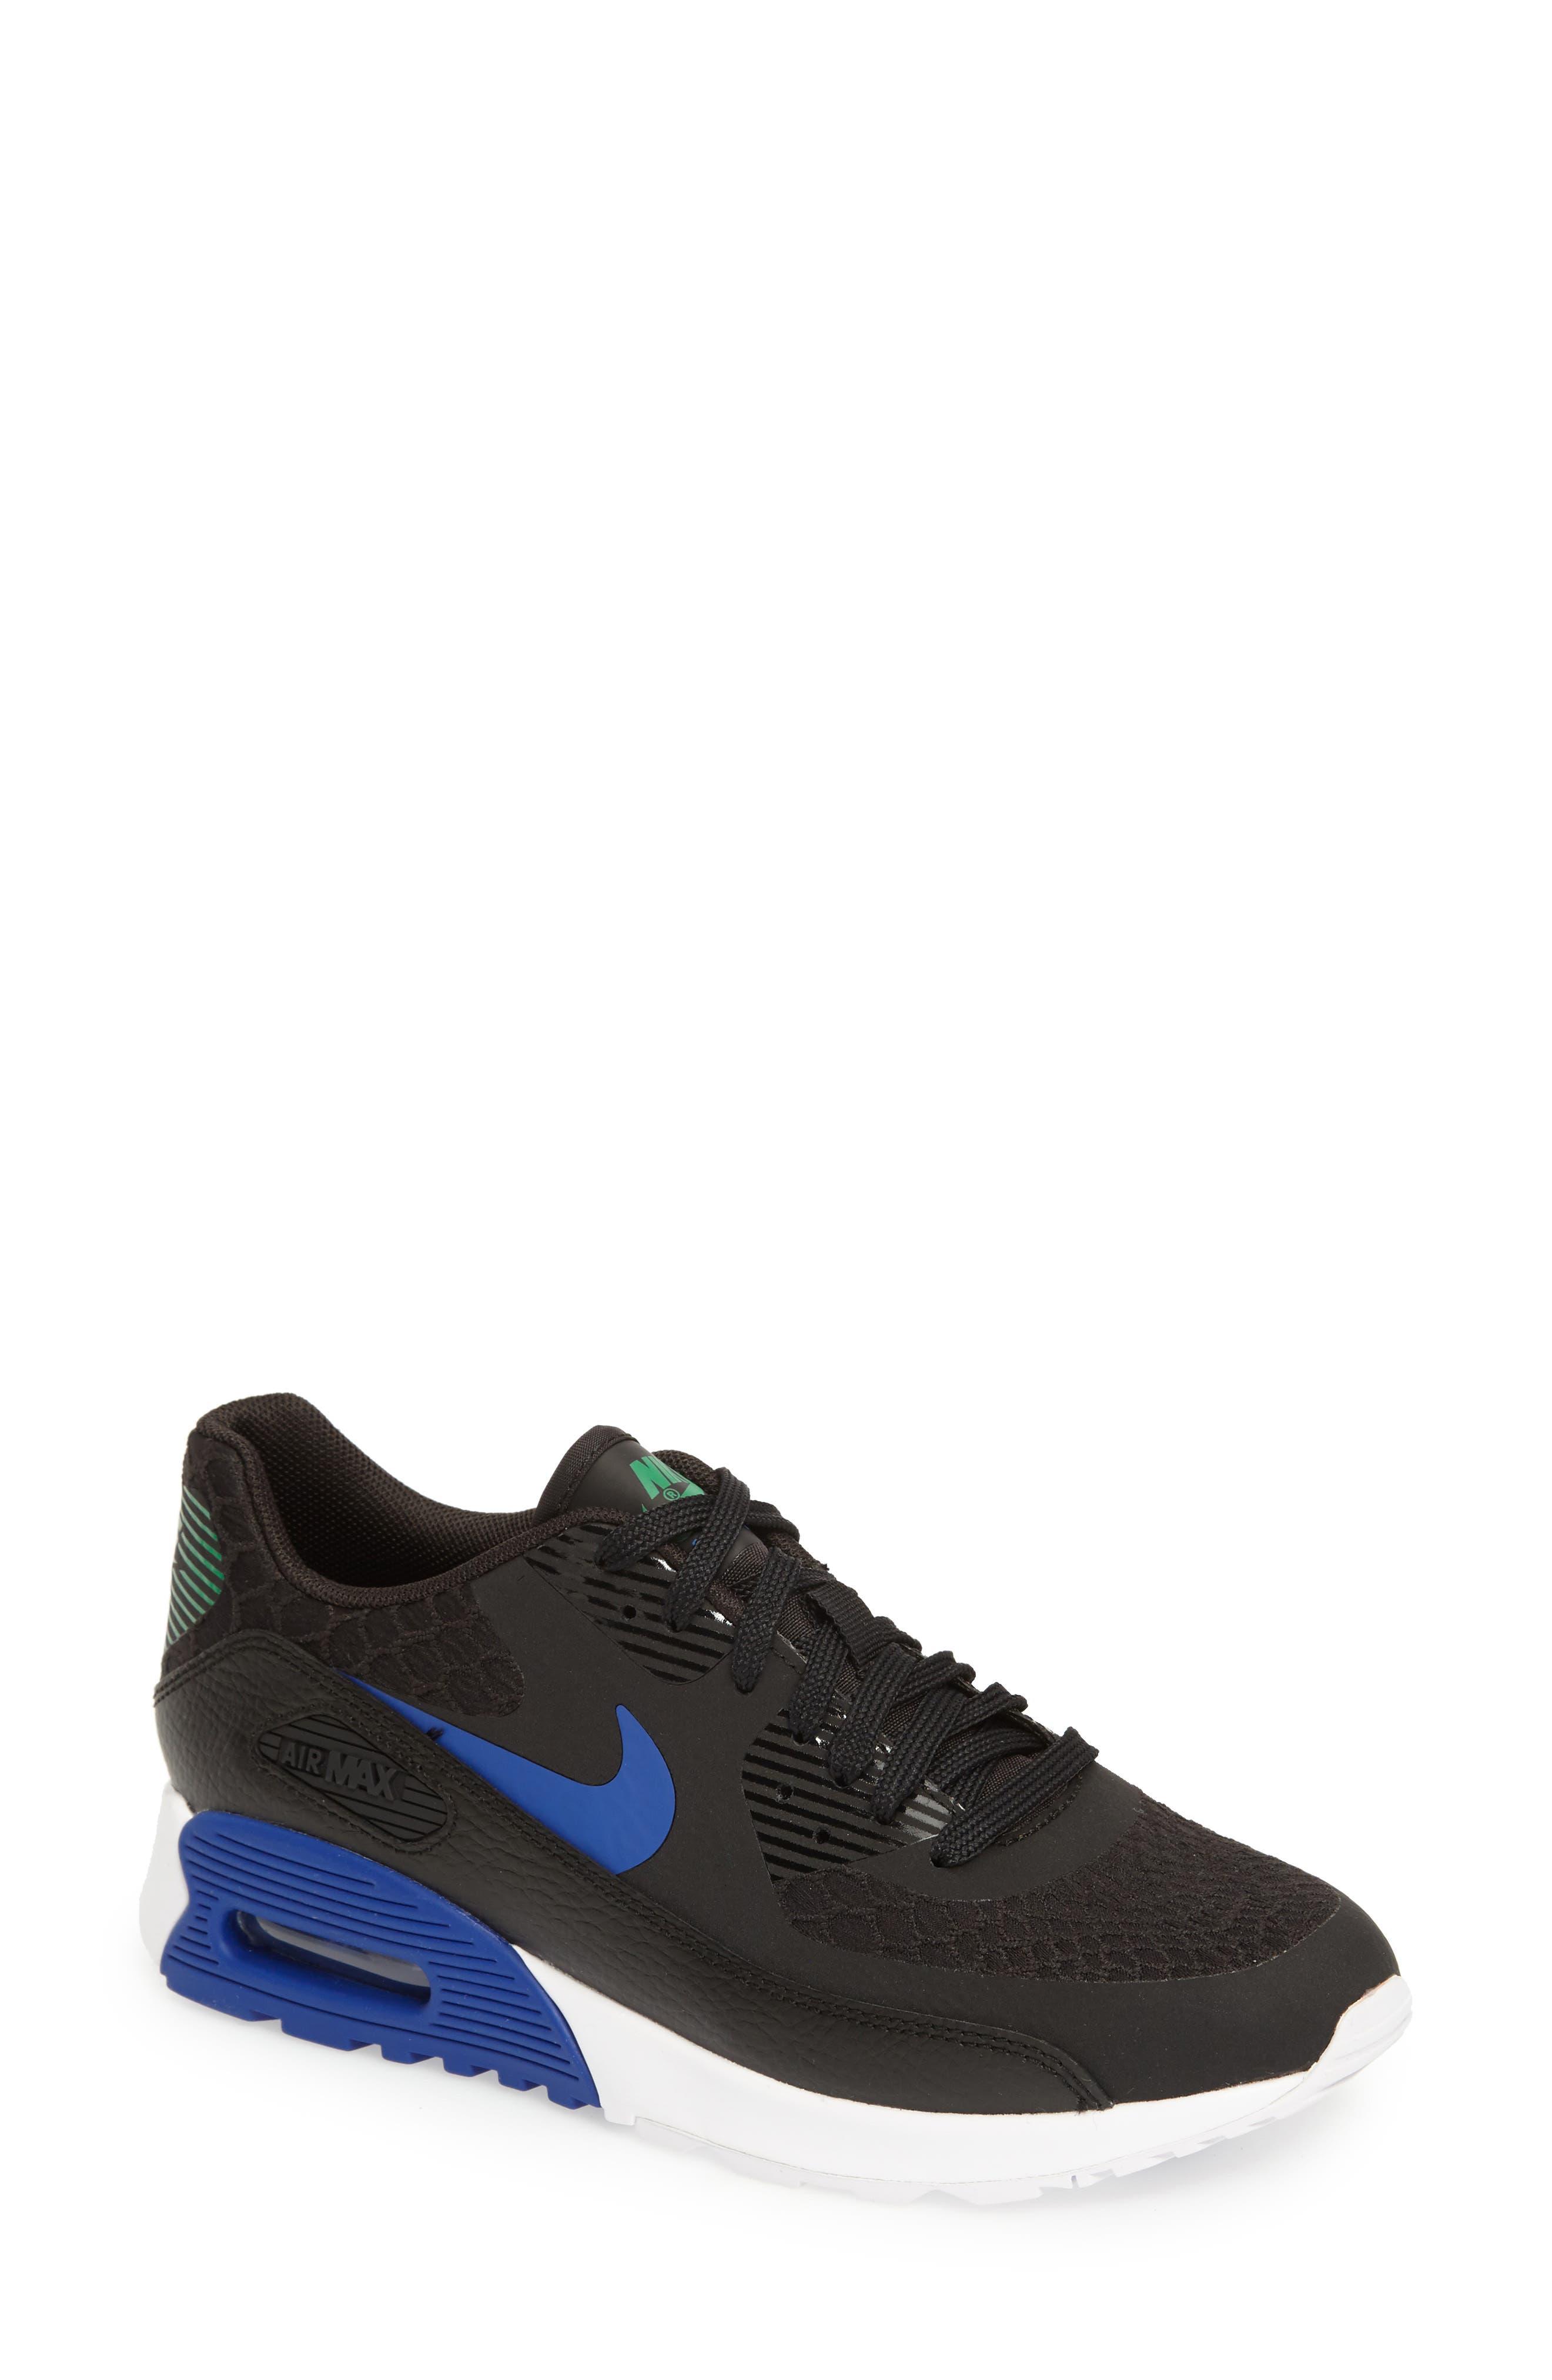 Air Max 90 Ultra 2.0 Sneaker,                             Main thumbnail 1, color,                             001